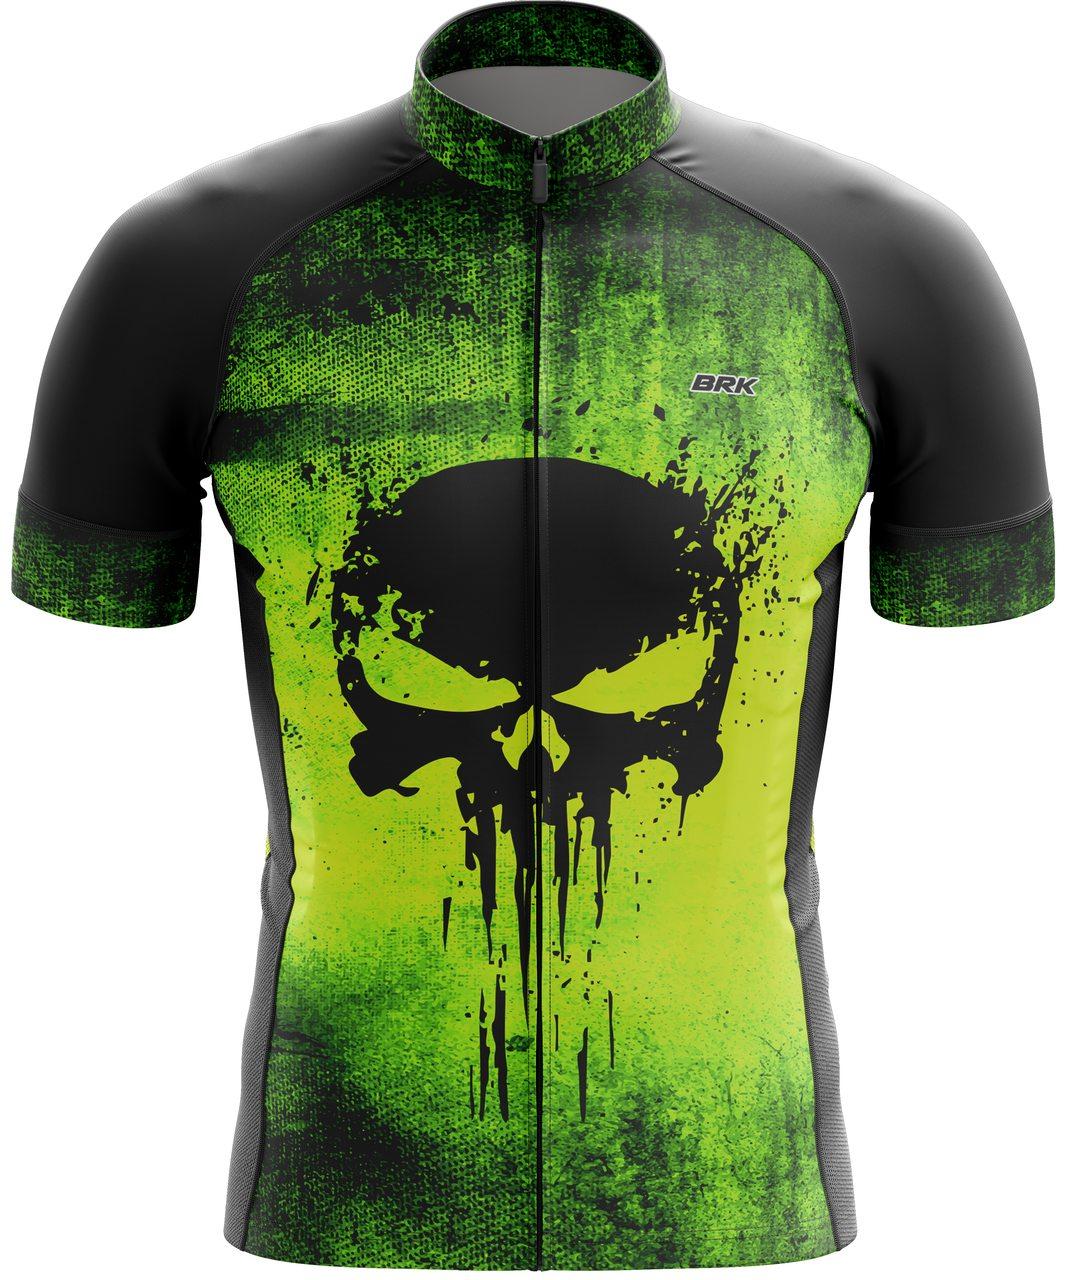 Camisa Ciclismo Brk The Punisher Verde com FPU 50+